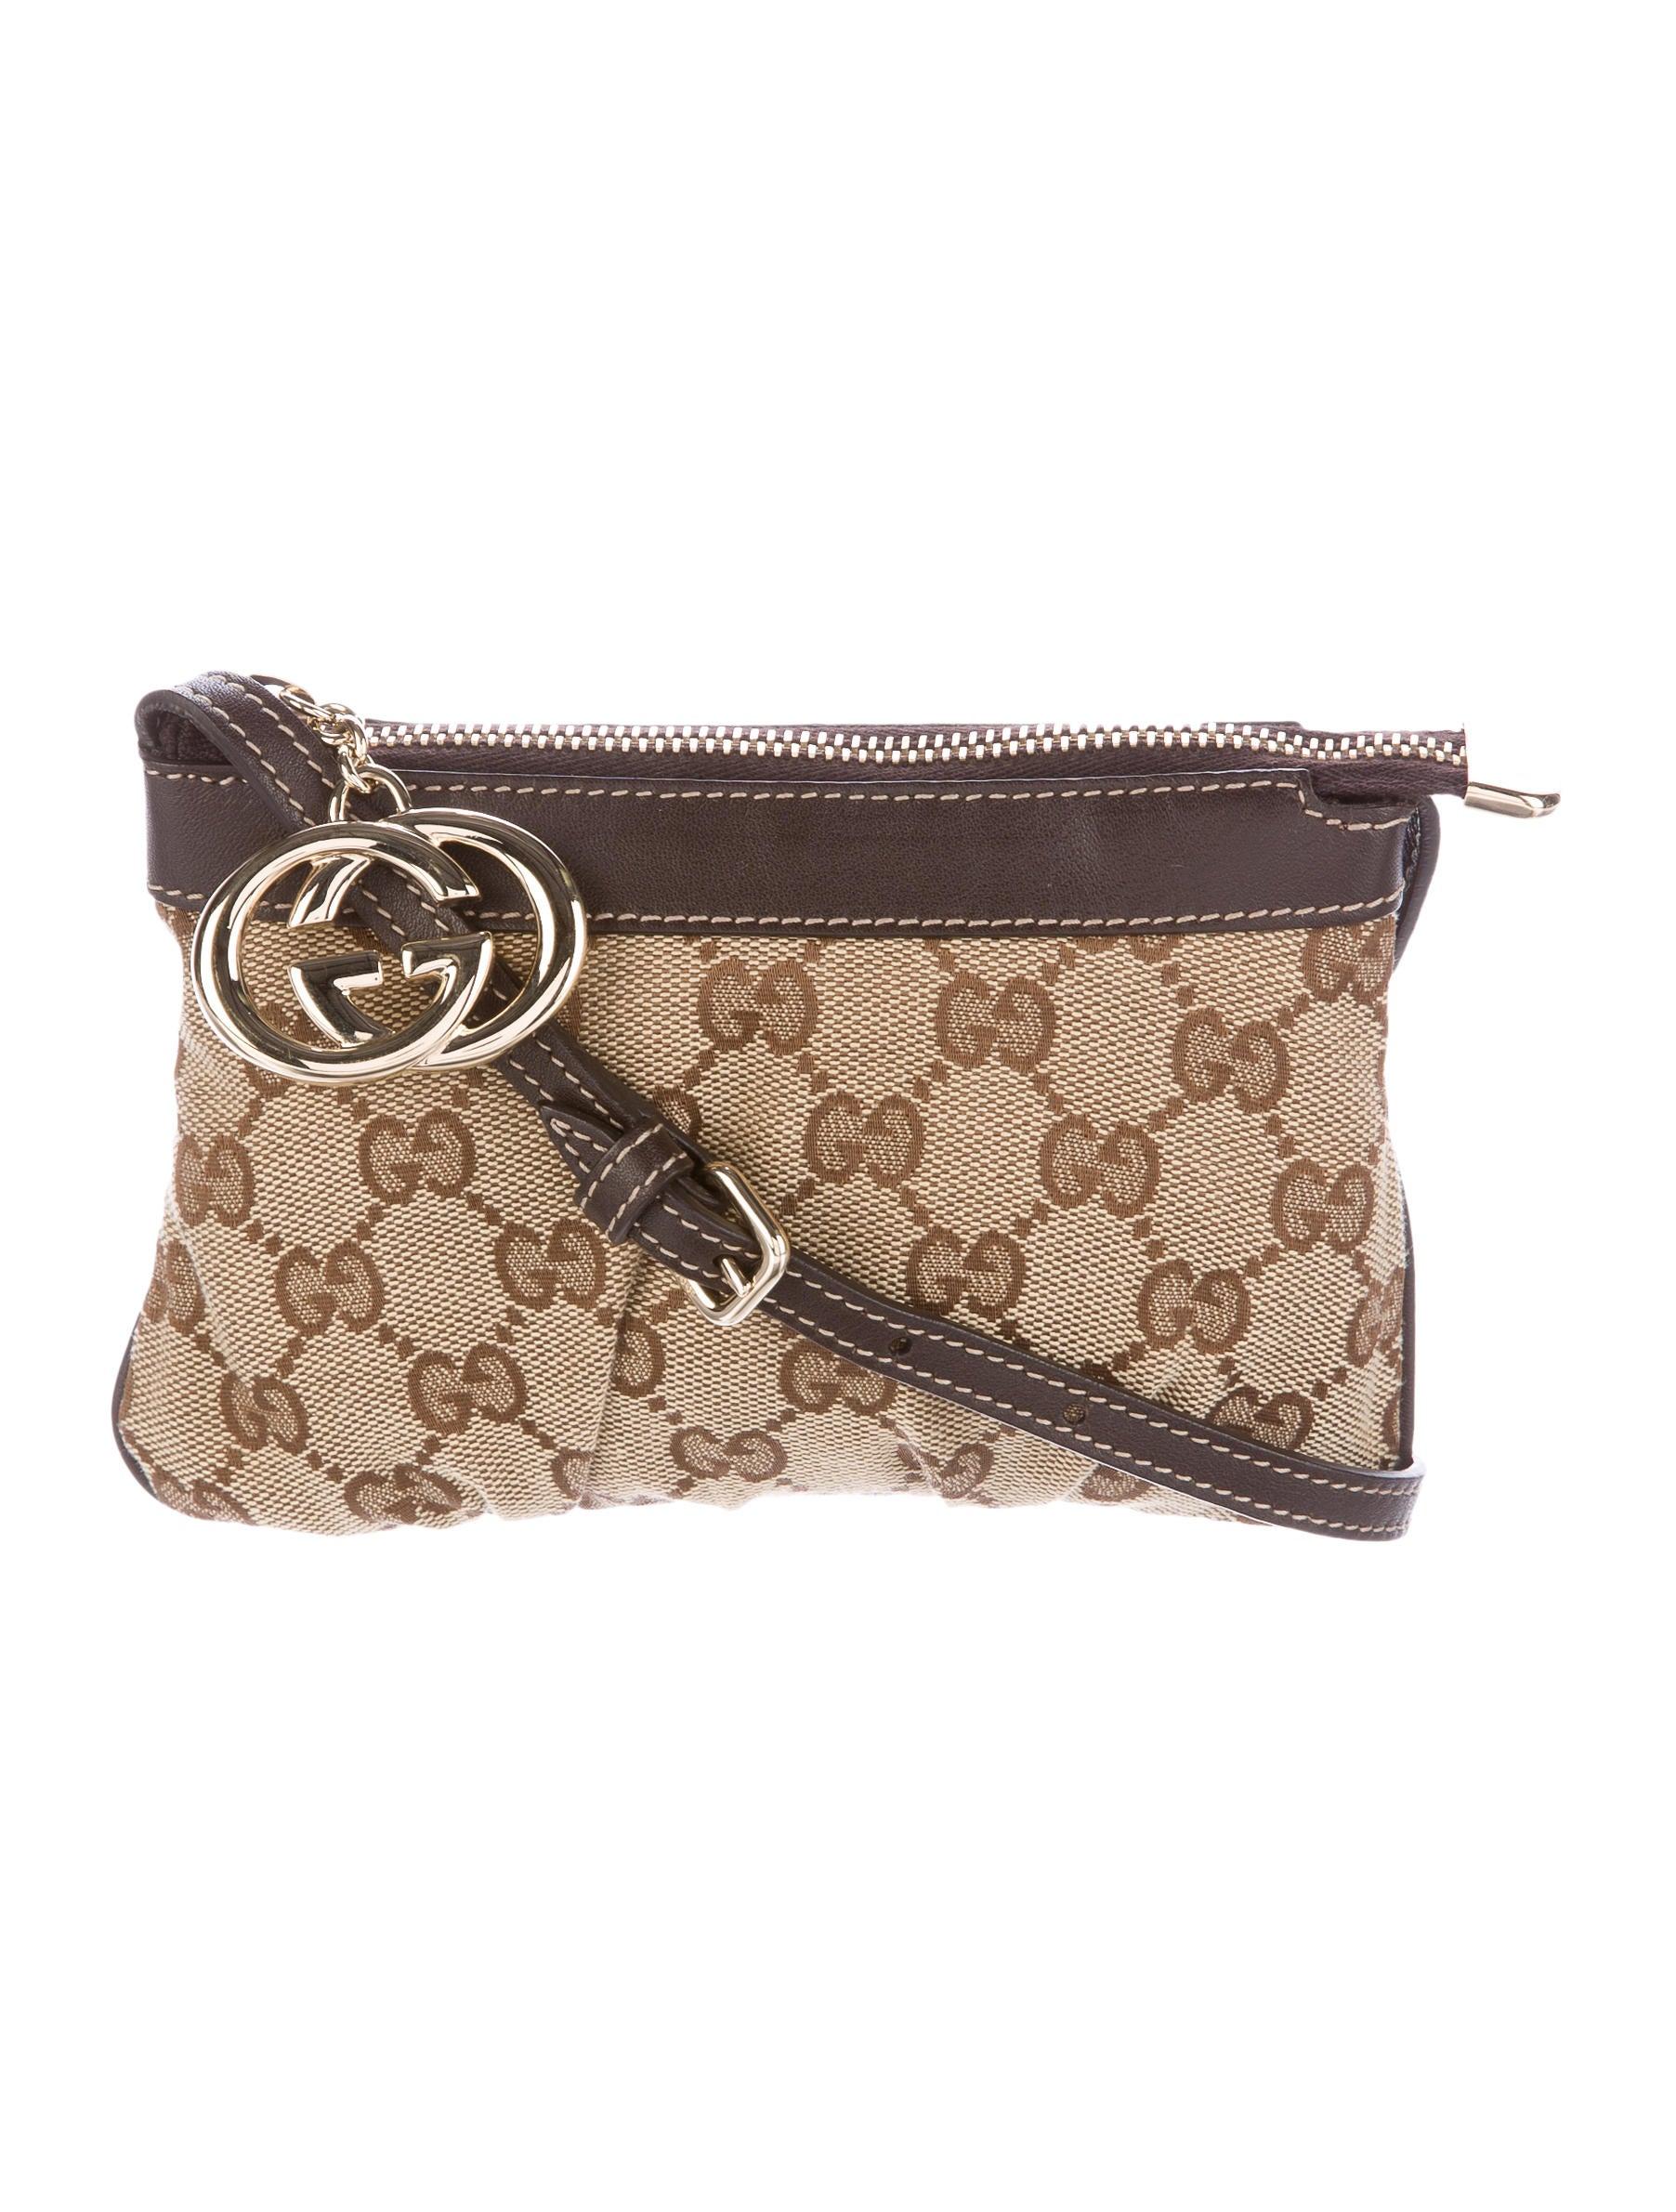 Amazing Gucci Bamboo Sling Bag - Handbags - GUC132826 | The RealReal